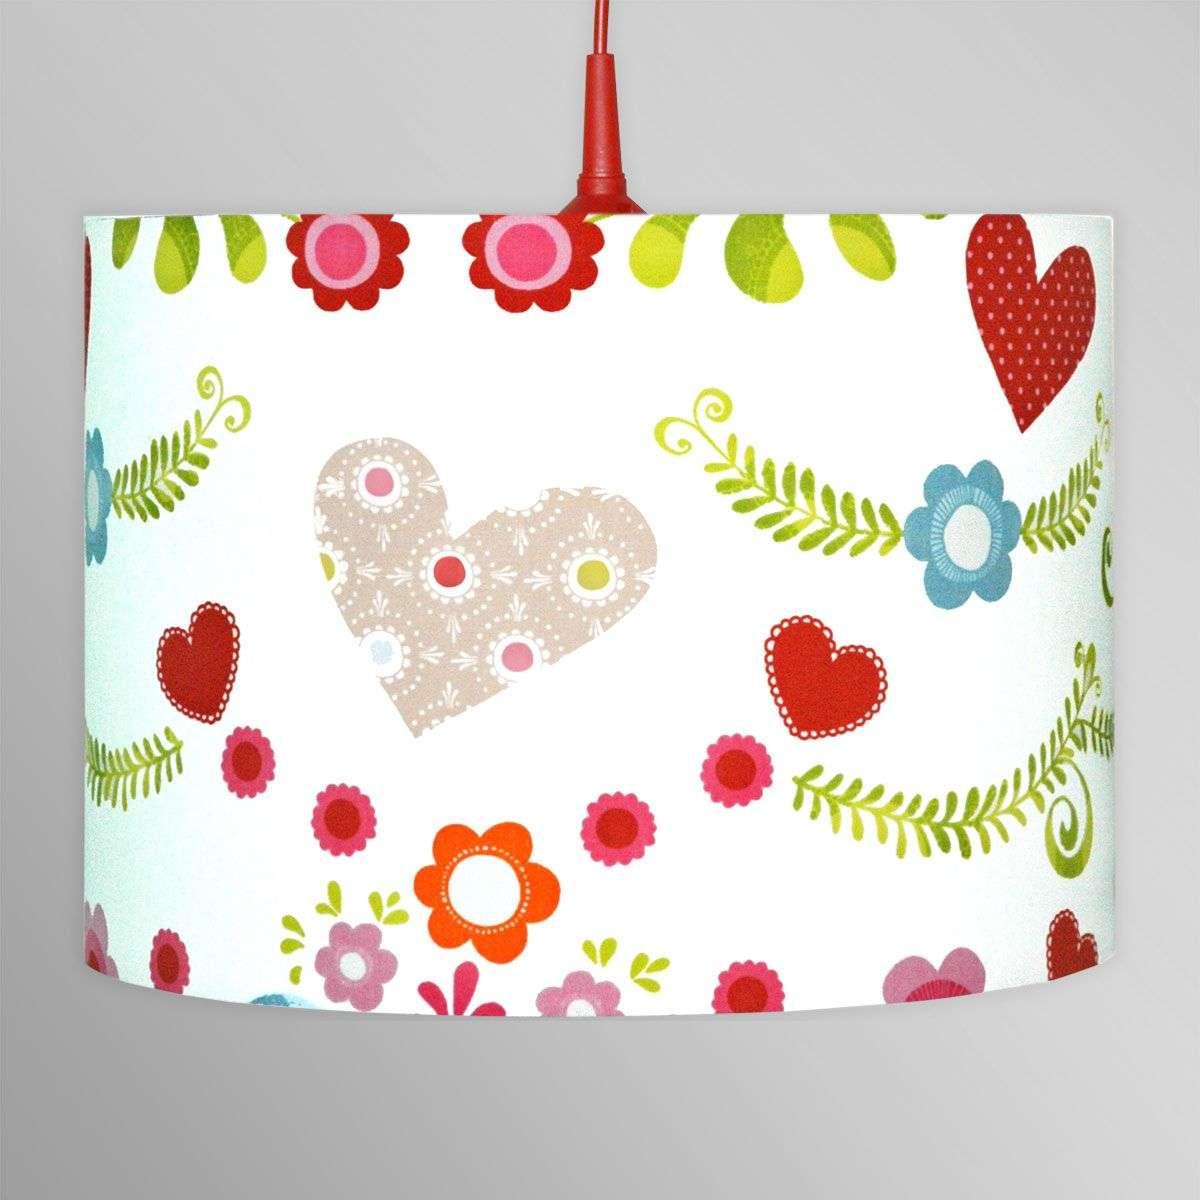 childrens pendant lighting. Magical Bloom Childrens Pendant Light-9606205-31 Lighting